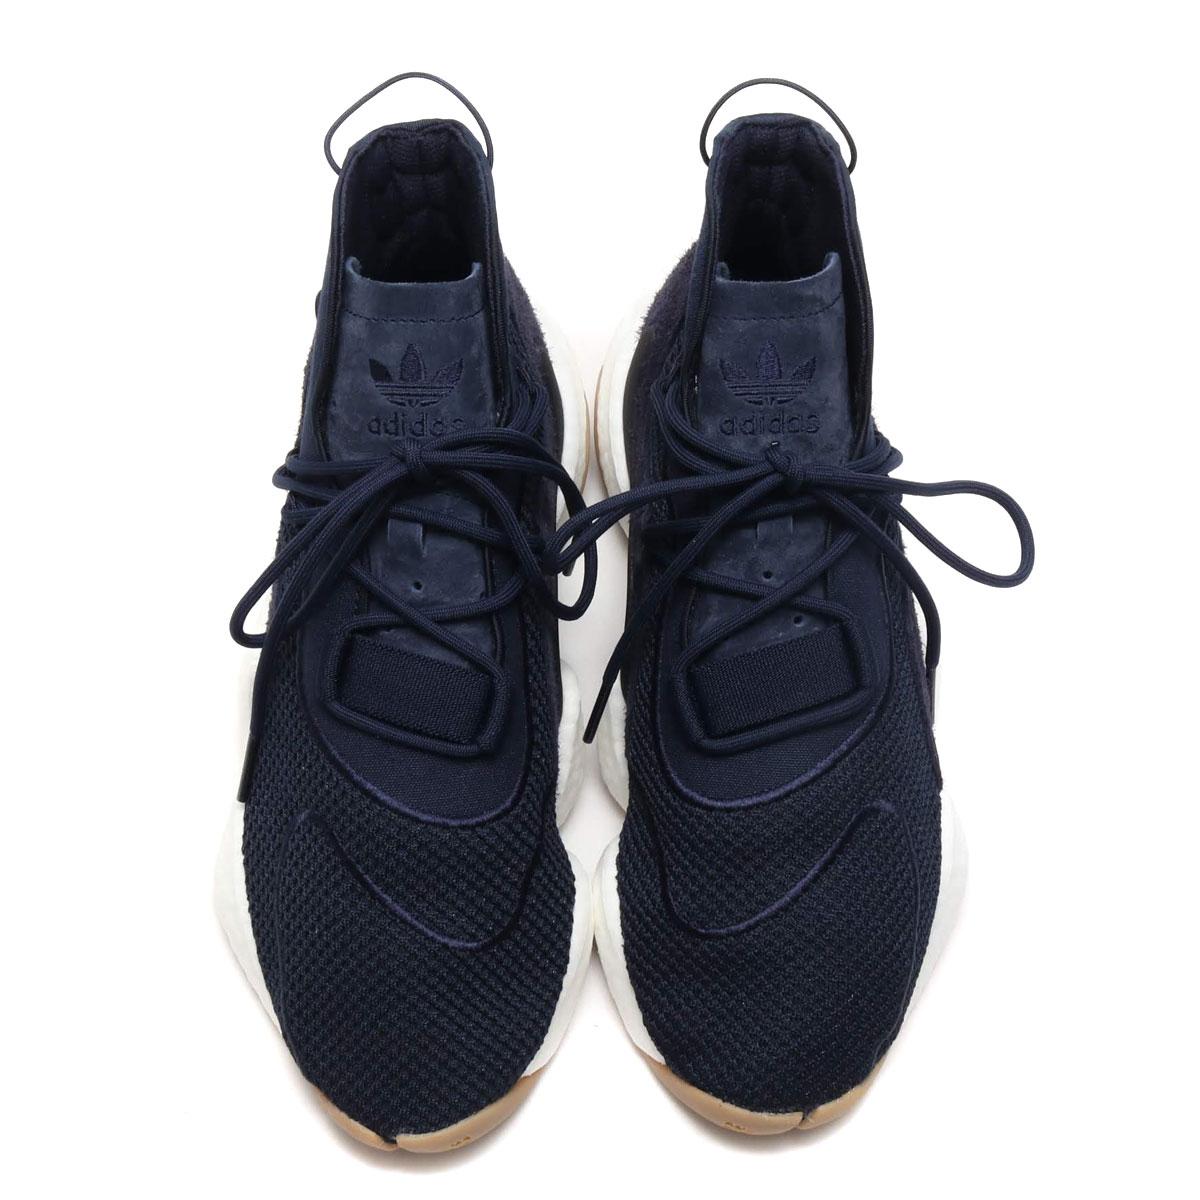 dabf8f1d ... adidas Originals CRAZY BYW LVL I (LEGEND INK/COLLEGE NAVY/GUM16) ...